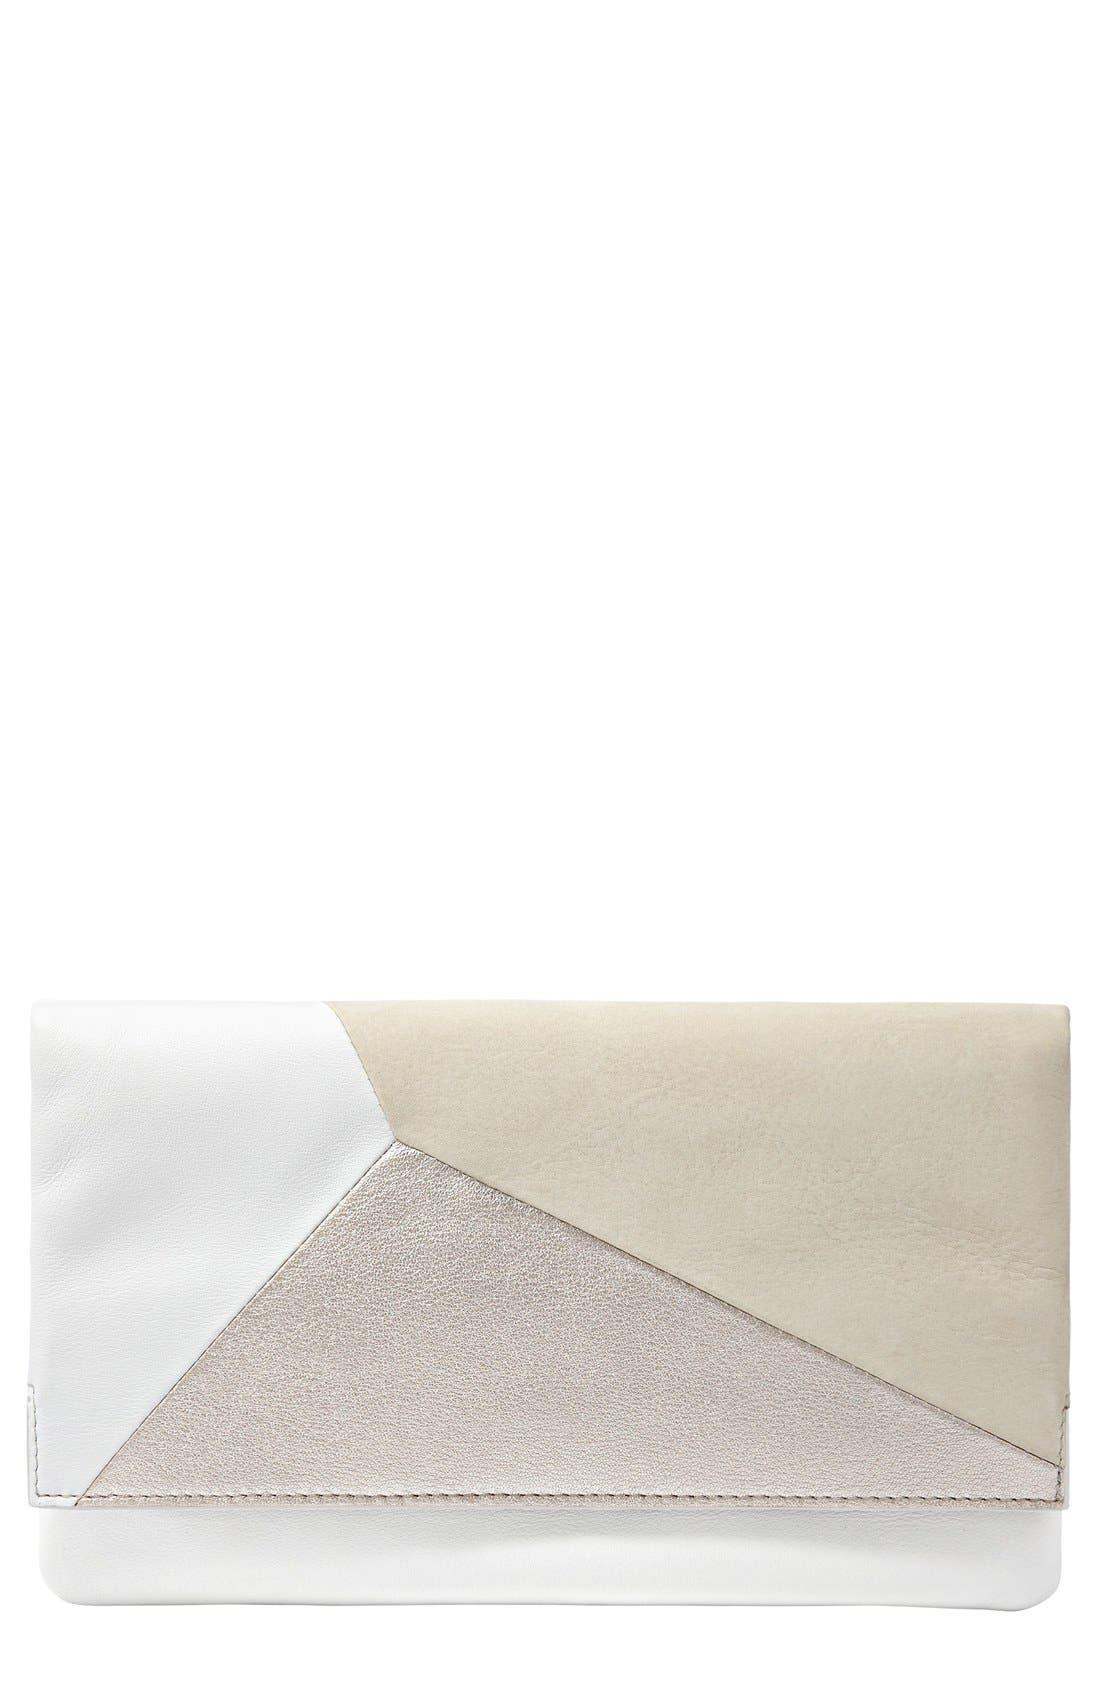 Alternate Image 1 Selected - Skagen Flap Clutch Wallet